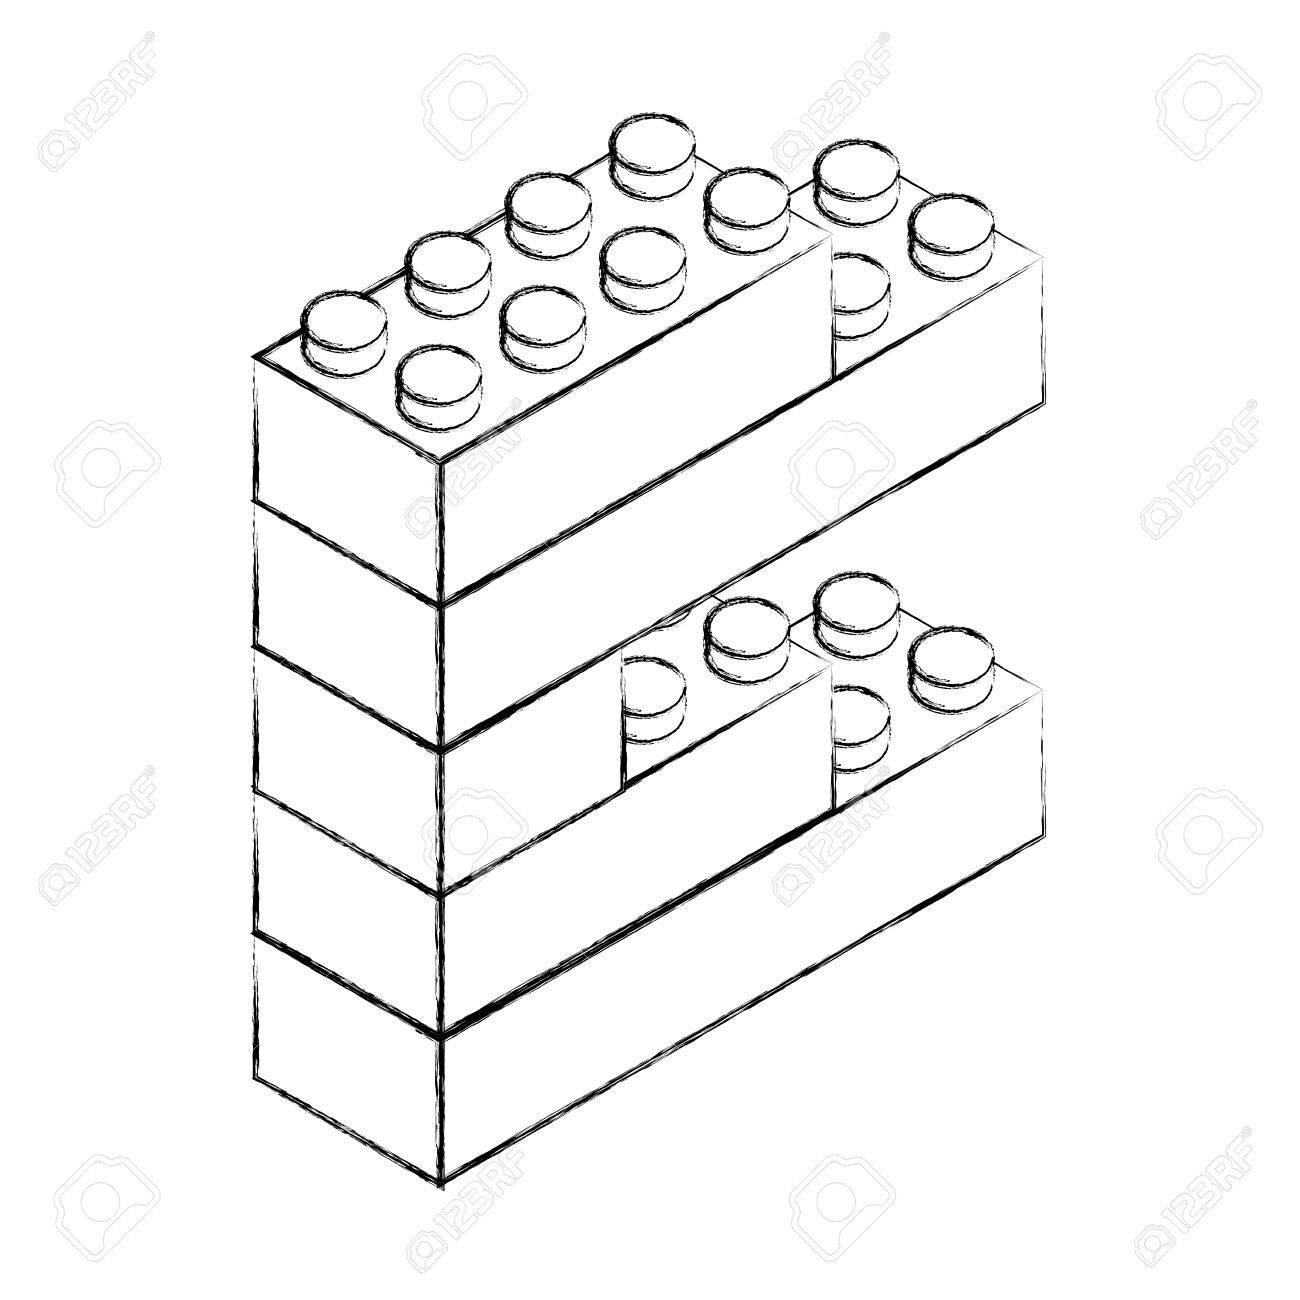 1300x1300 Sketch Draw Toy Building Block Bricks Vector Graphic Design